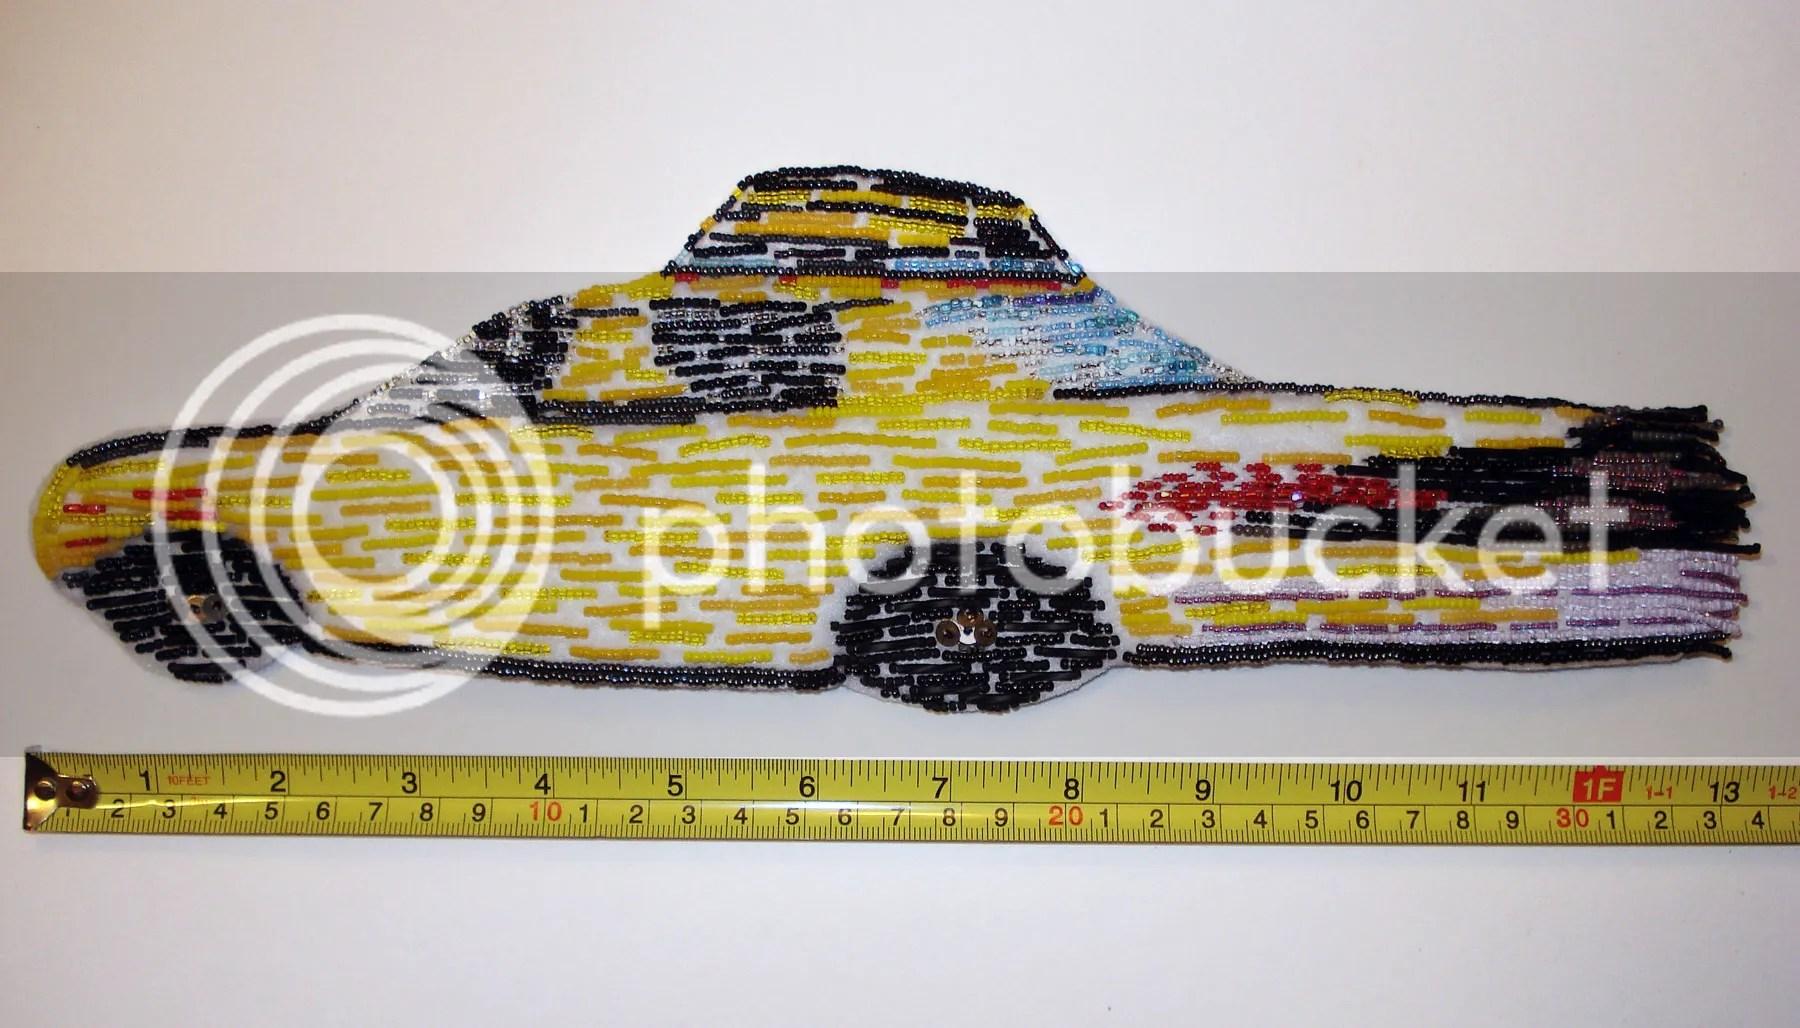 Beaded NYC taxi cab bead embroidery NYC street scene